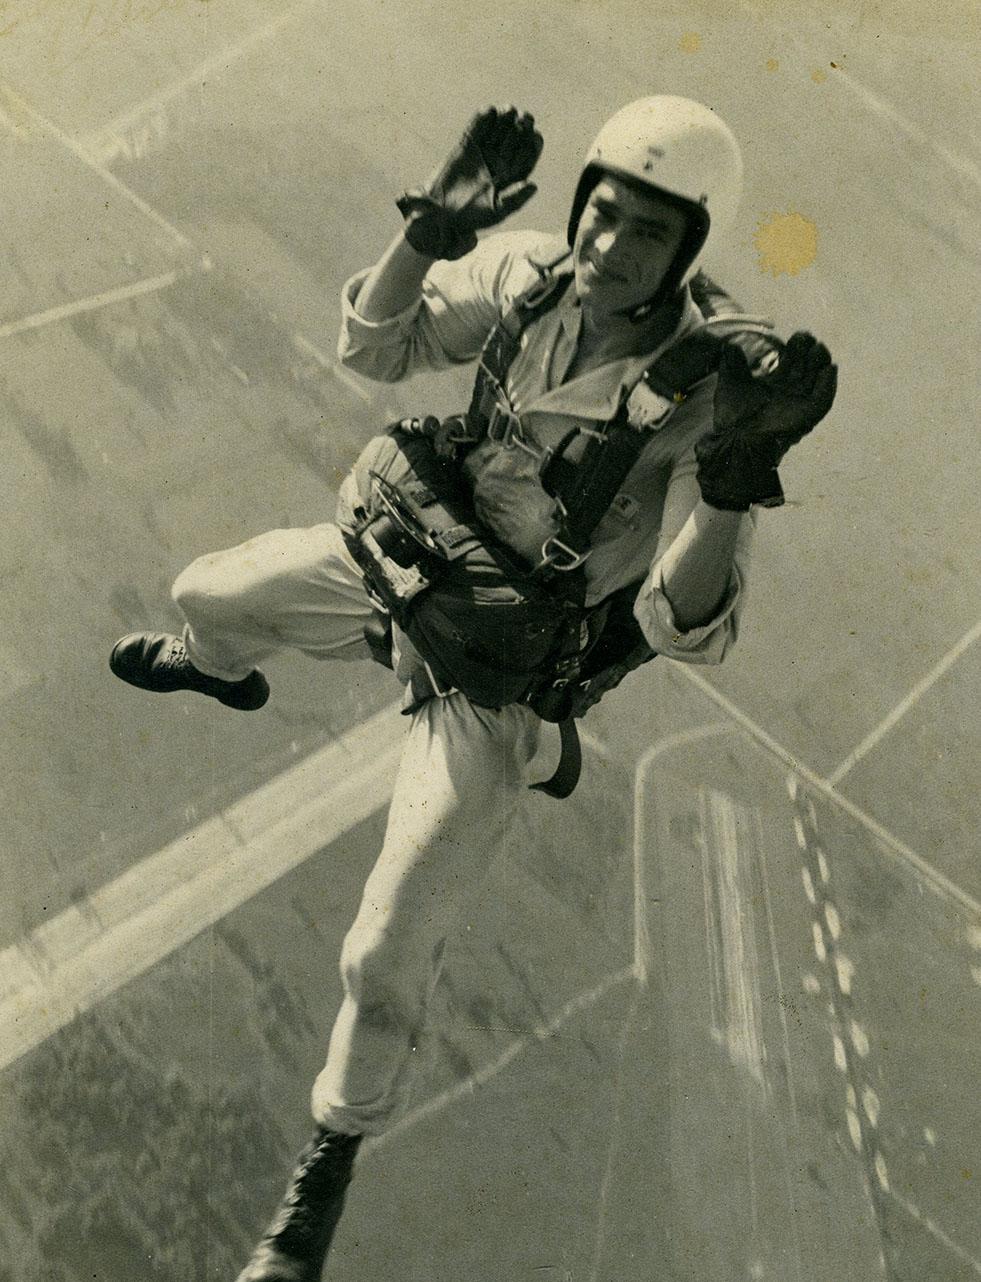 Skydive East Texas/East Texas Skydiving - Texas - Dropzone com